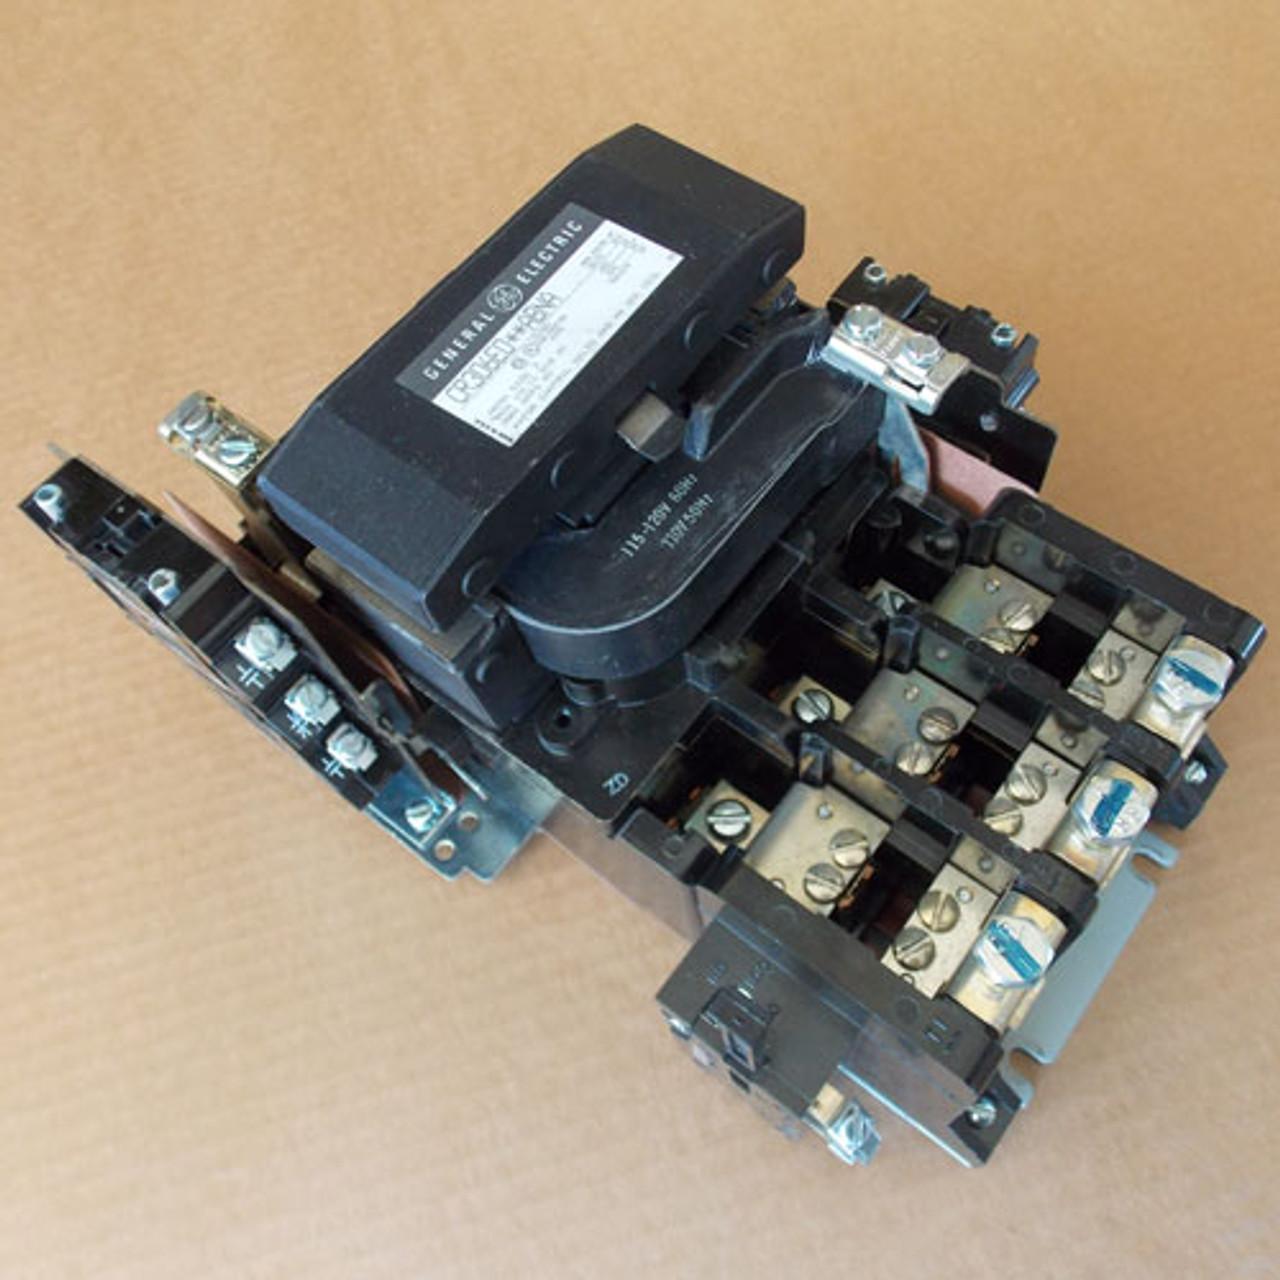 General Electric CR306E0**ABNA Size 3 Magnetic Starter 3P 120V Coil - Used